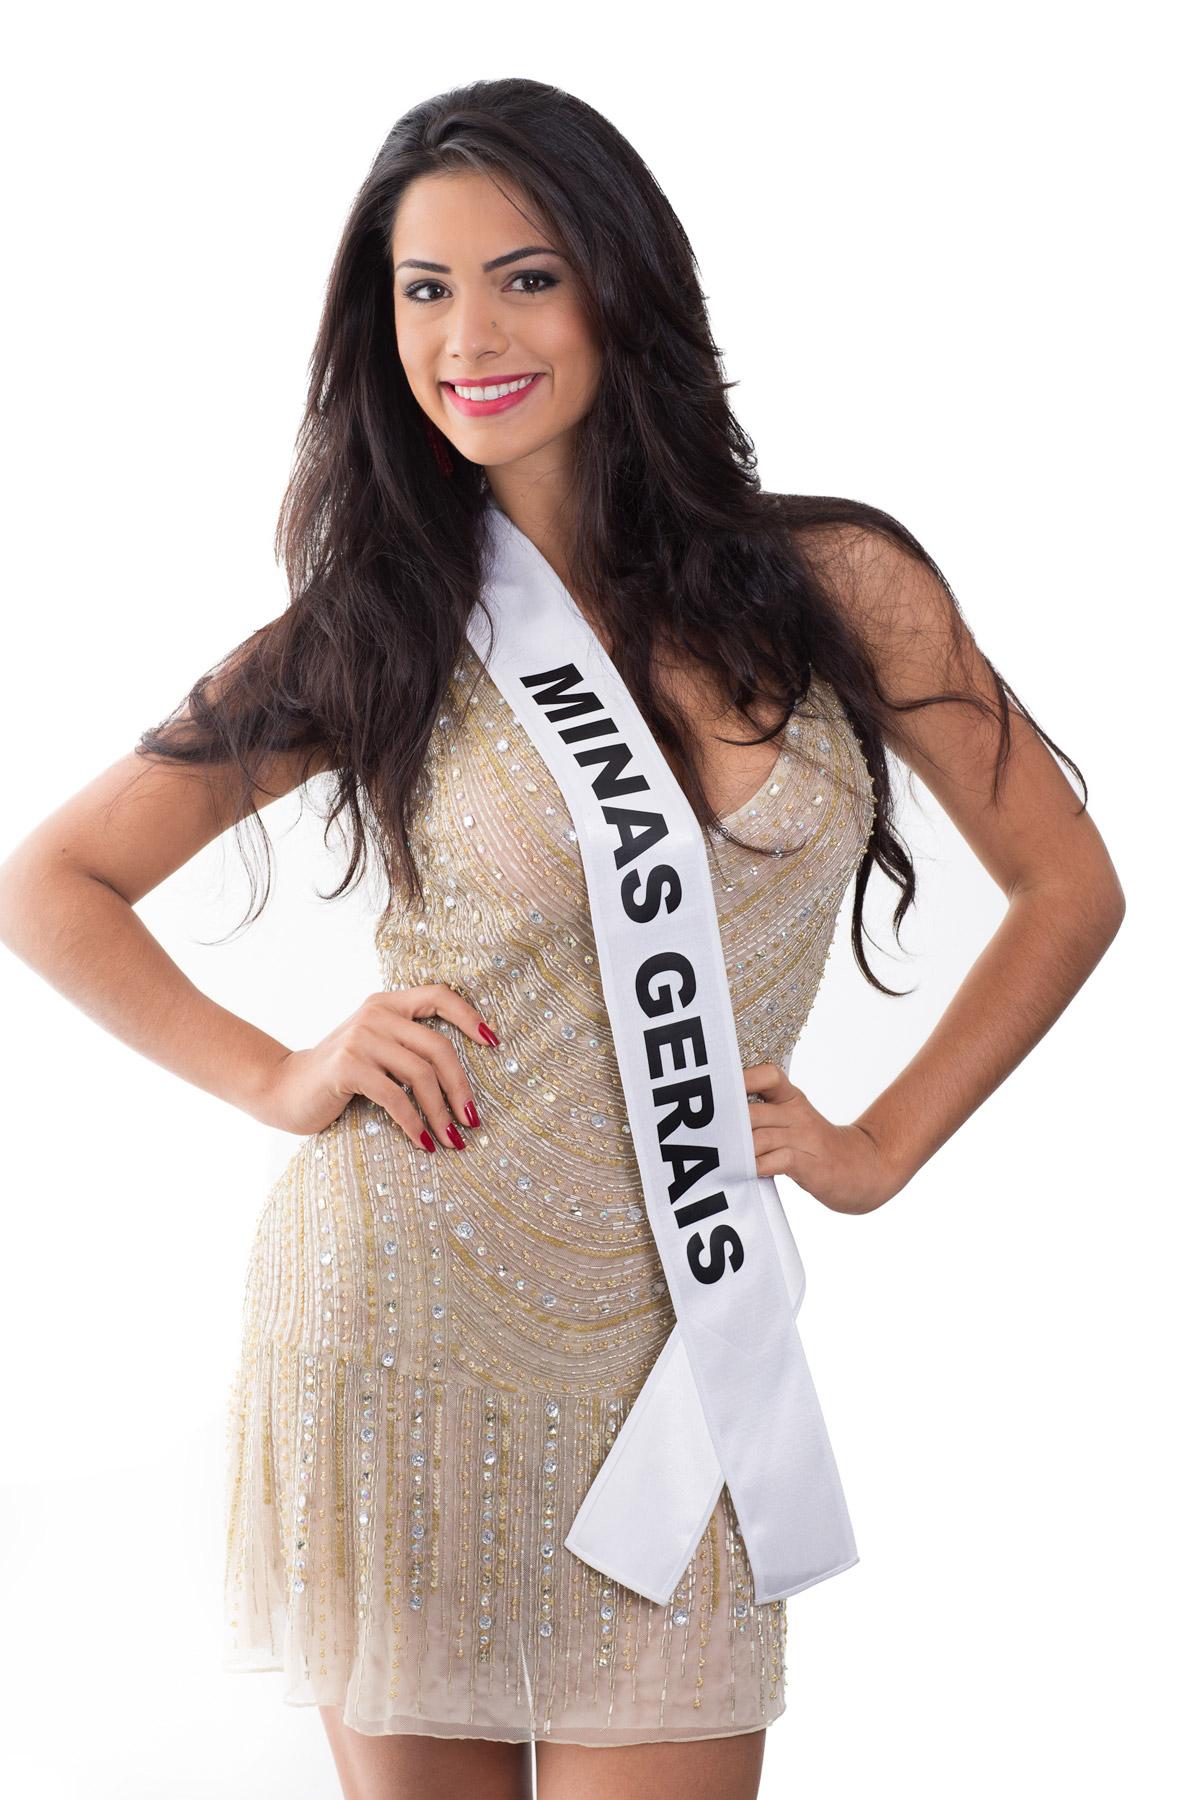 janaina barcelos, miss brasil motors internacional 2010. - Página 2 Heisd2d3